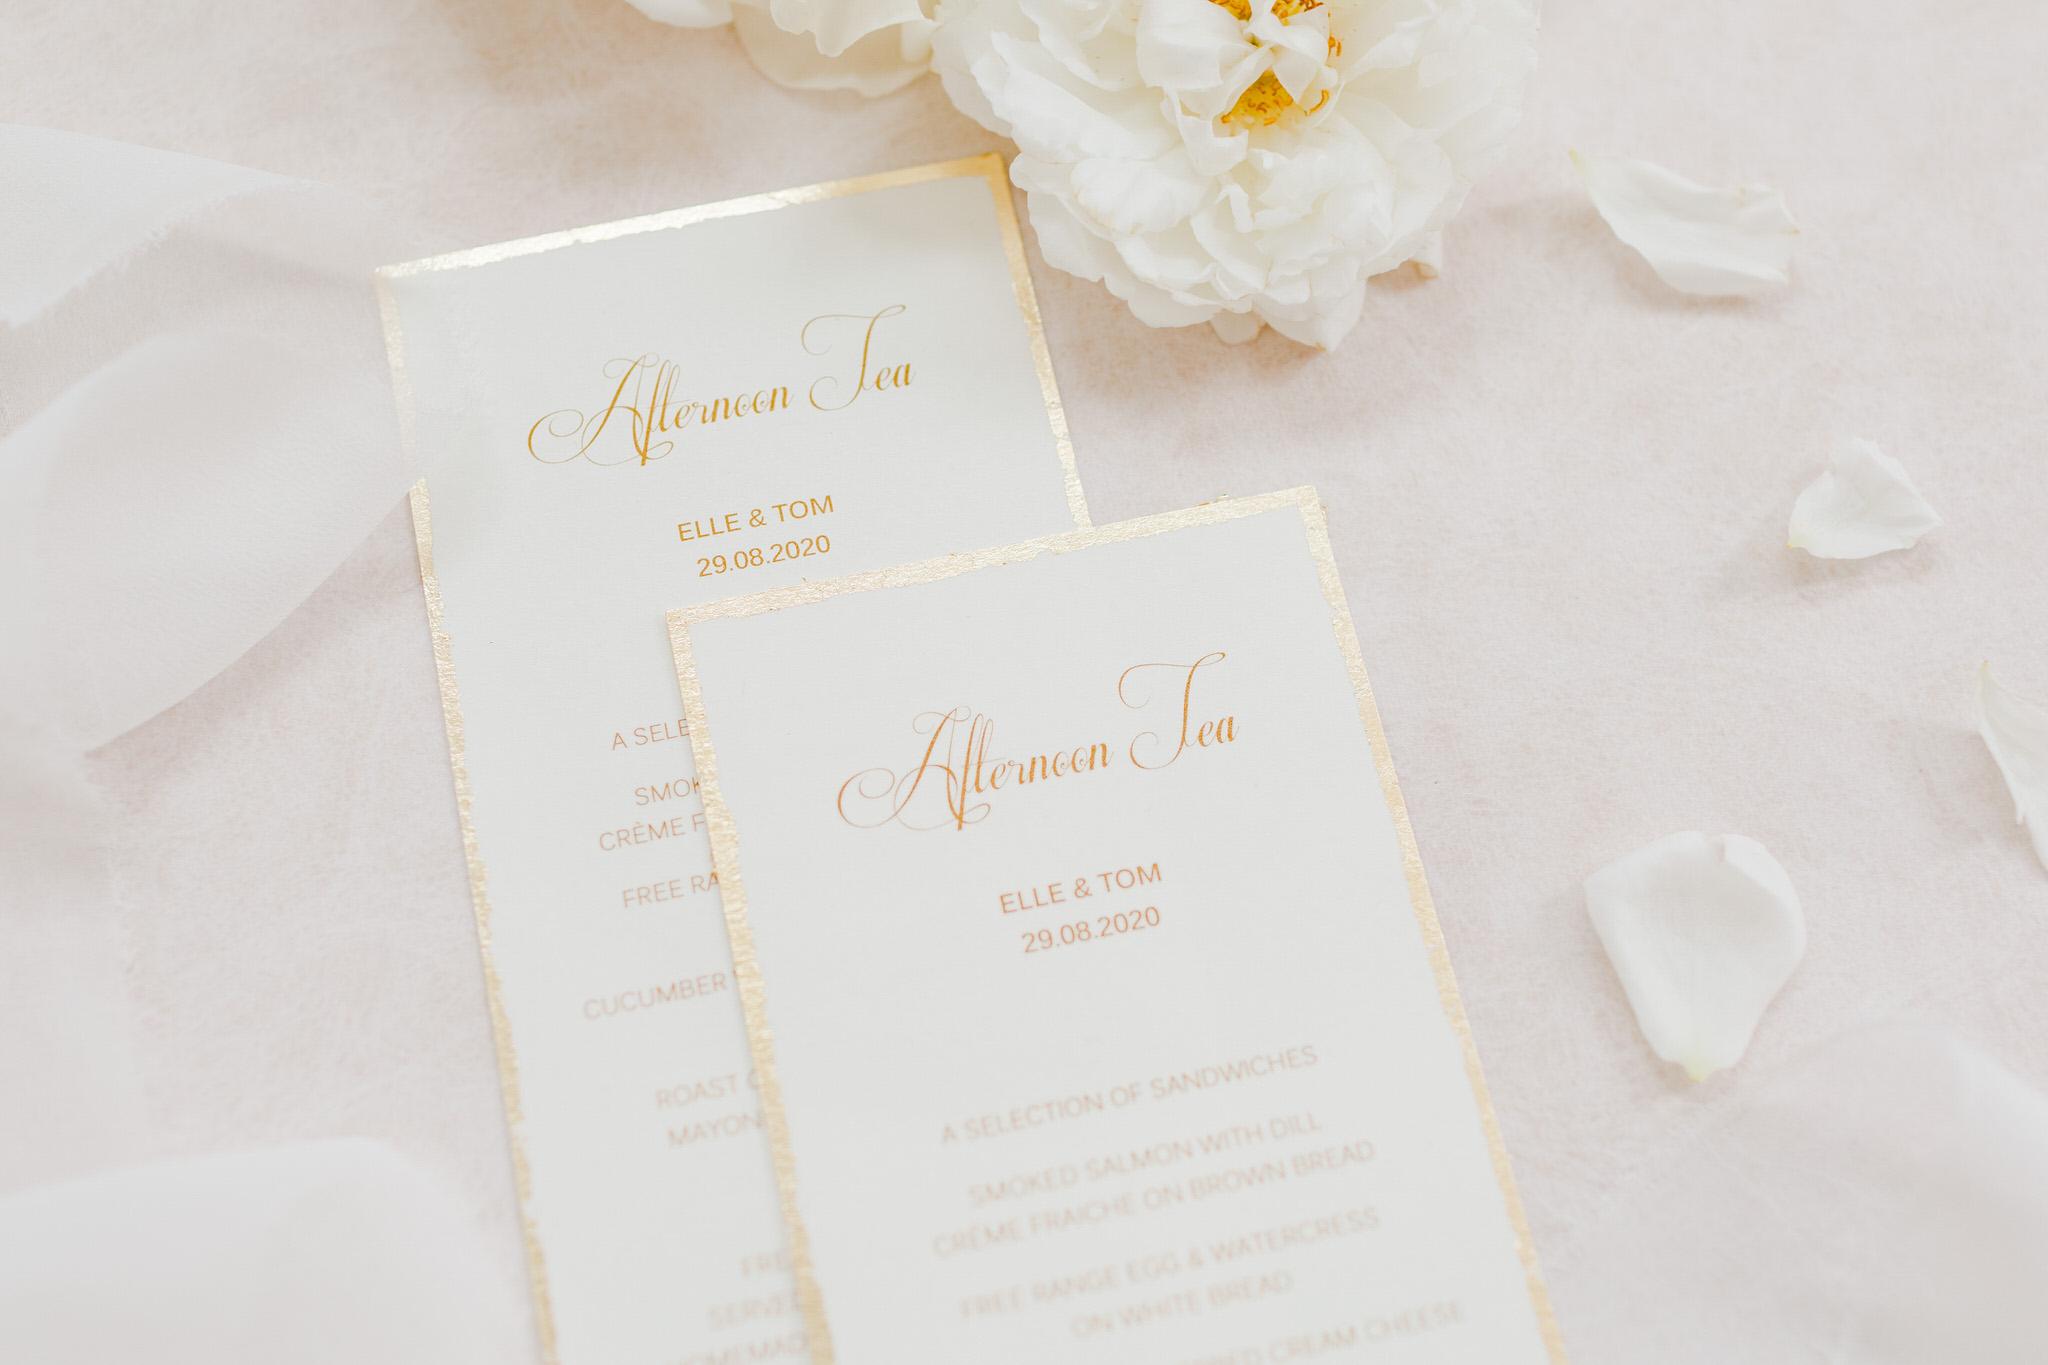 Bespoke menus by Tiggity Boo wedding stationery